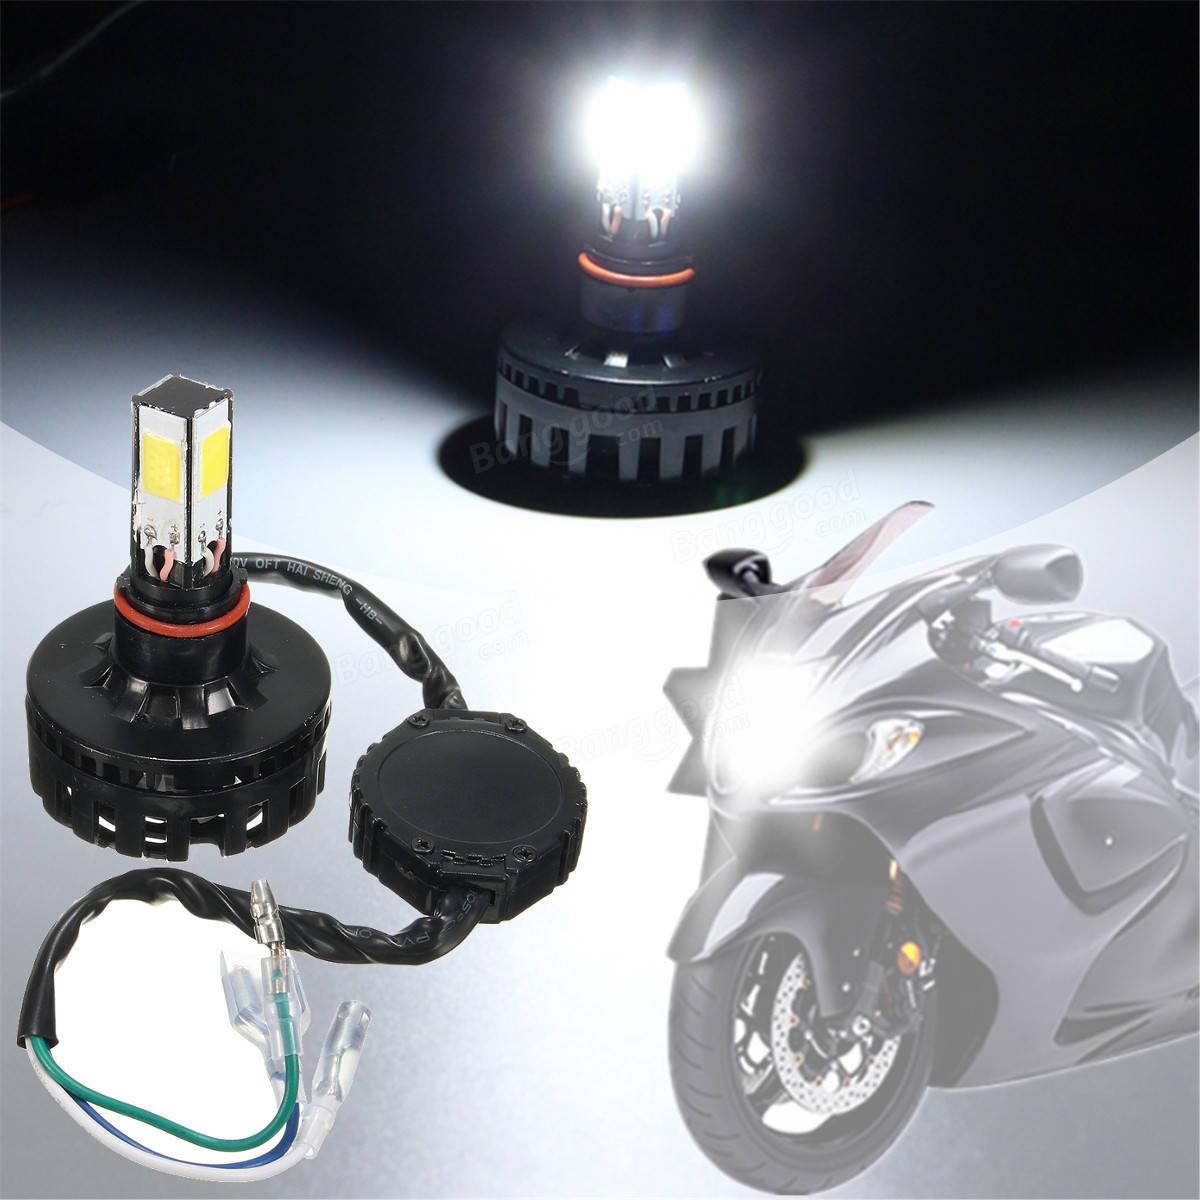 h4 hi lo moto 12v pannocchia led lampadina del faro ba20d h6 vendita. Black Bedroom Furniture Sets. Home Design Ideas